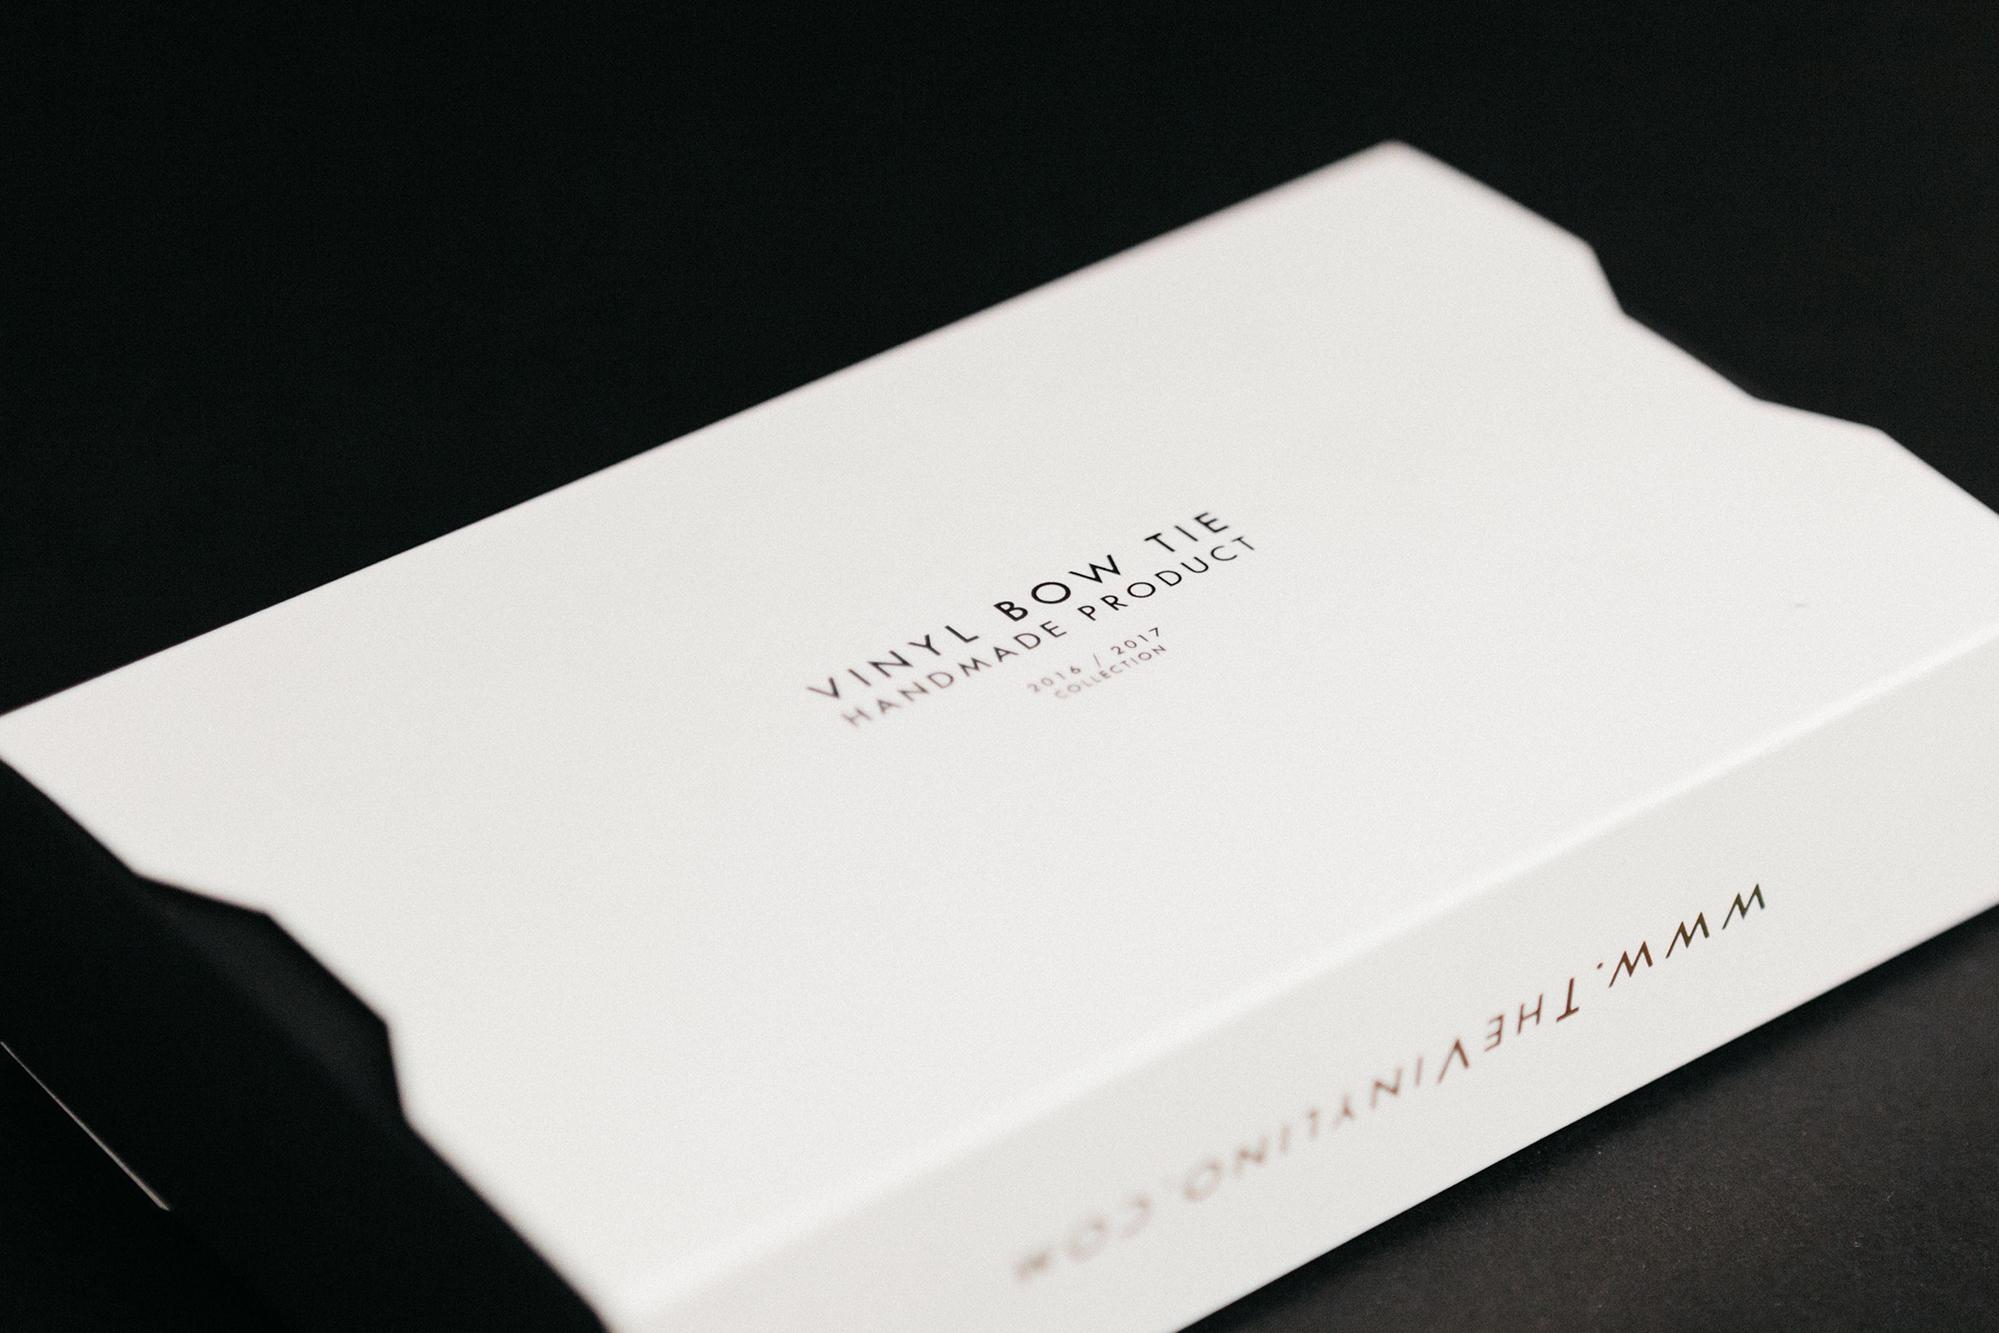 The Vinylino Box